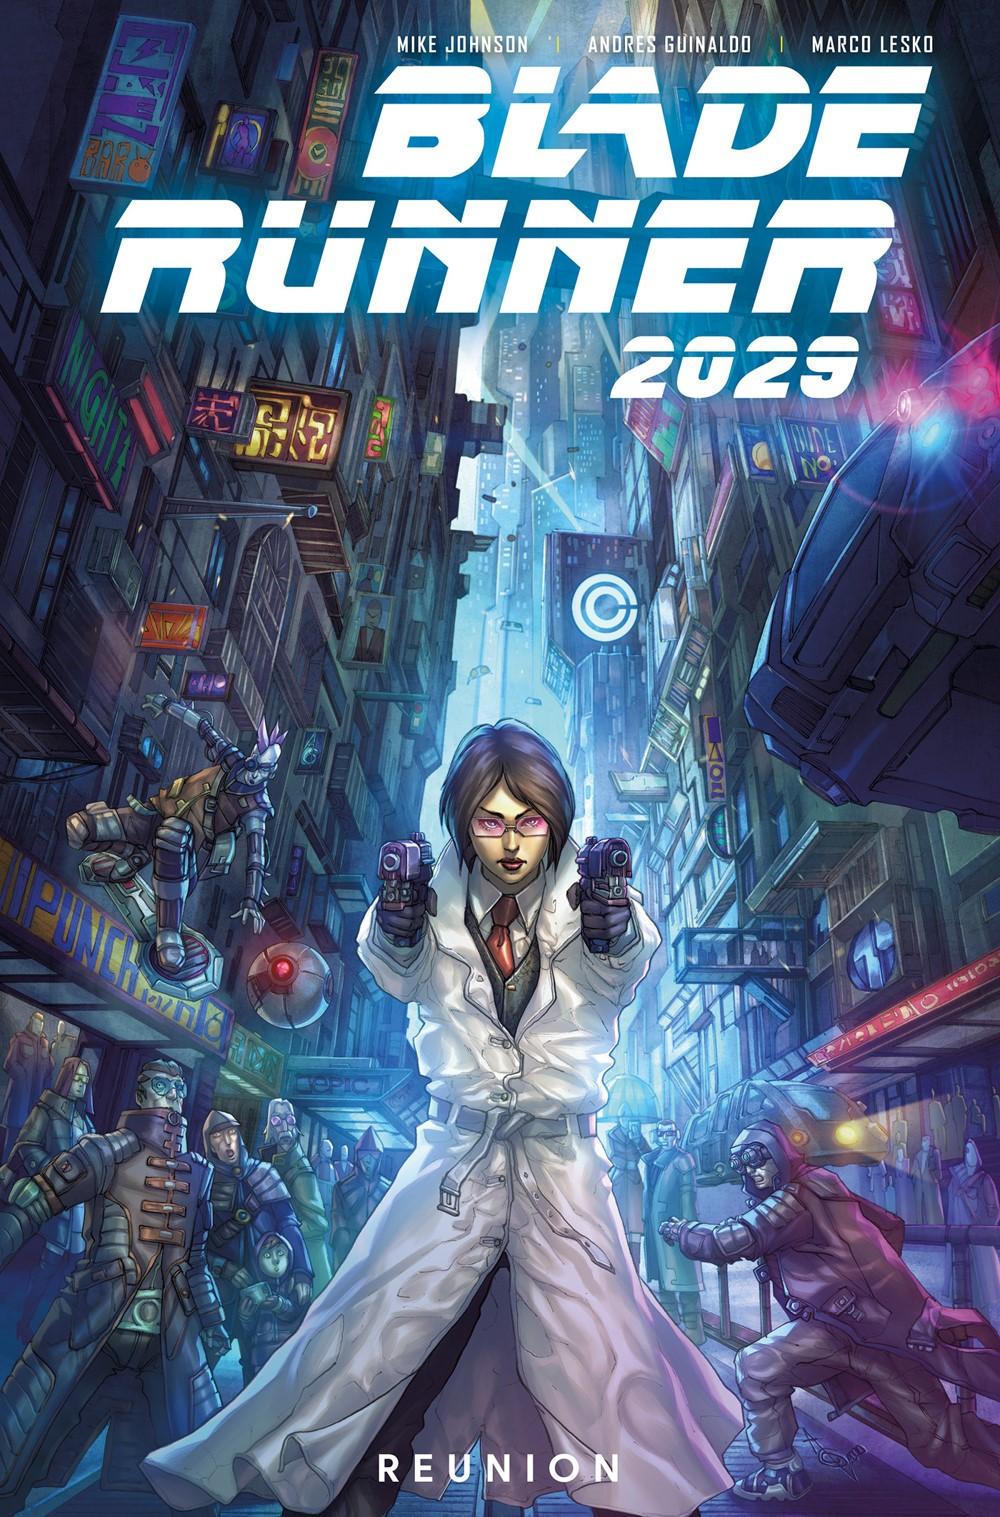 Blade-Runner-2029-Vol-1-Reunion-Cover ComicList Previews: BLADE RUNNER 2029 VOLUME 1 REUNION TP